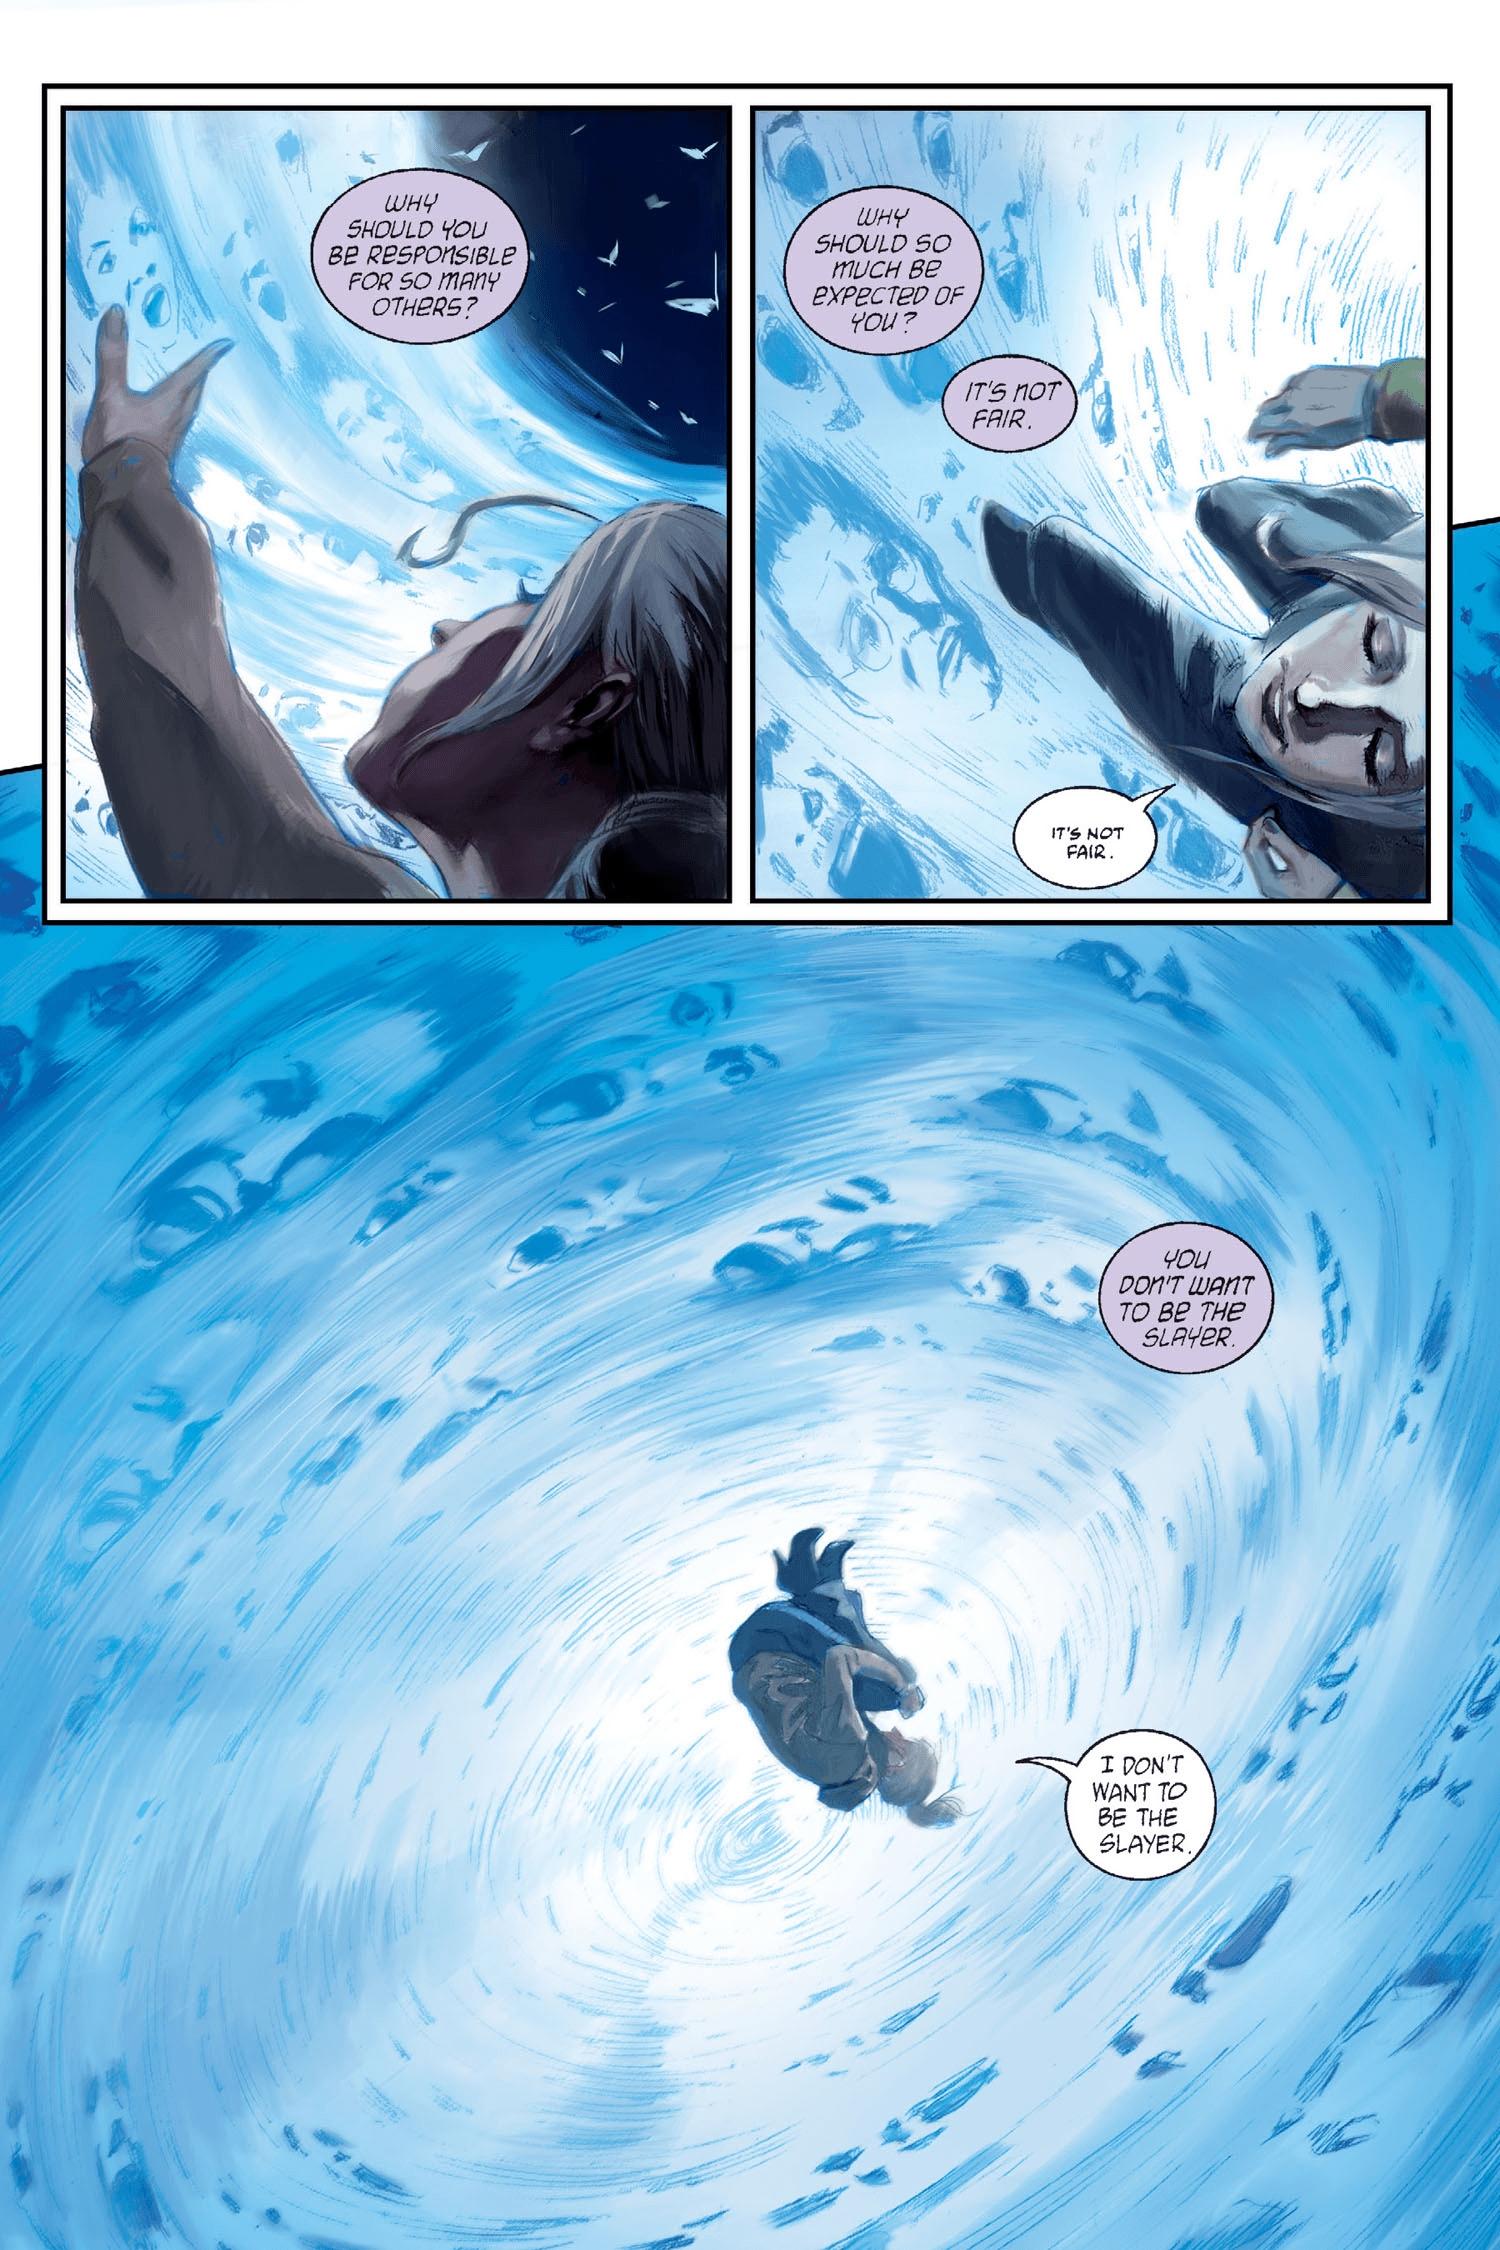 Read online Buffy the Vampire Slayer: Omnibus comic -  Issue # TPB 2 - 99